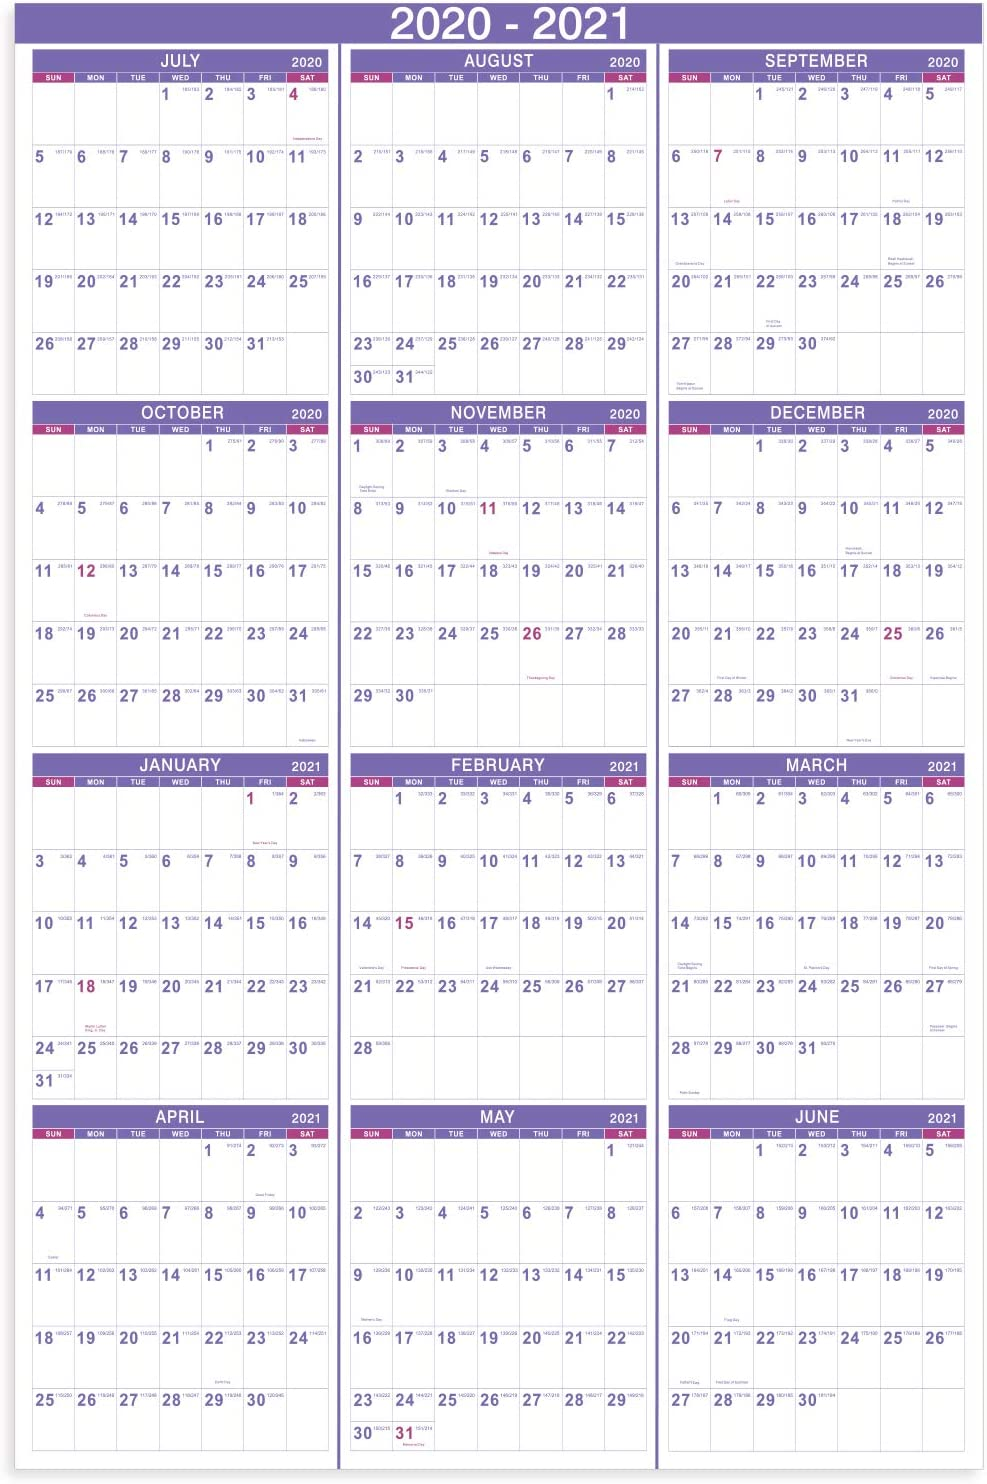 Yearly Wall Calendar 2021 Amazon.: 2020 2021 Yearly Wall Calendar   2020 2021 Academic